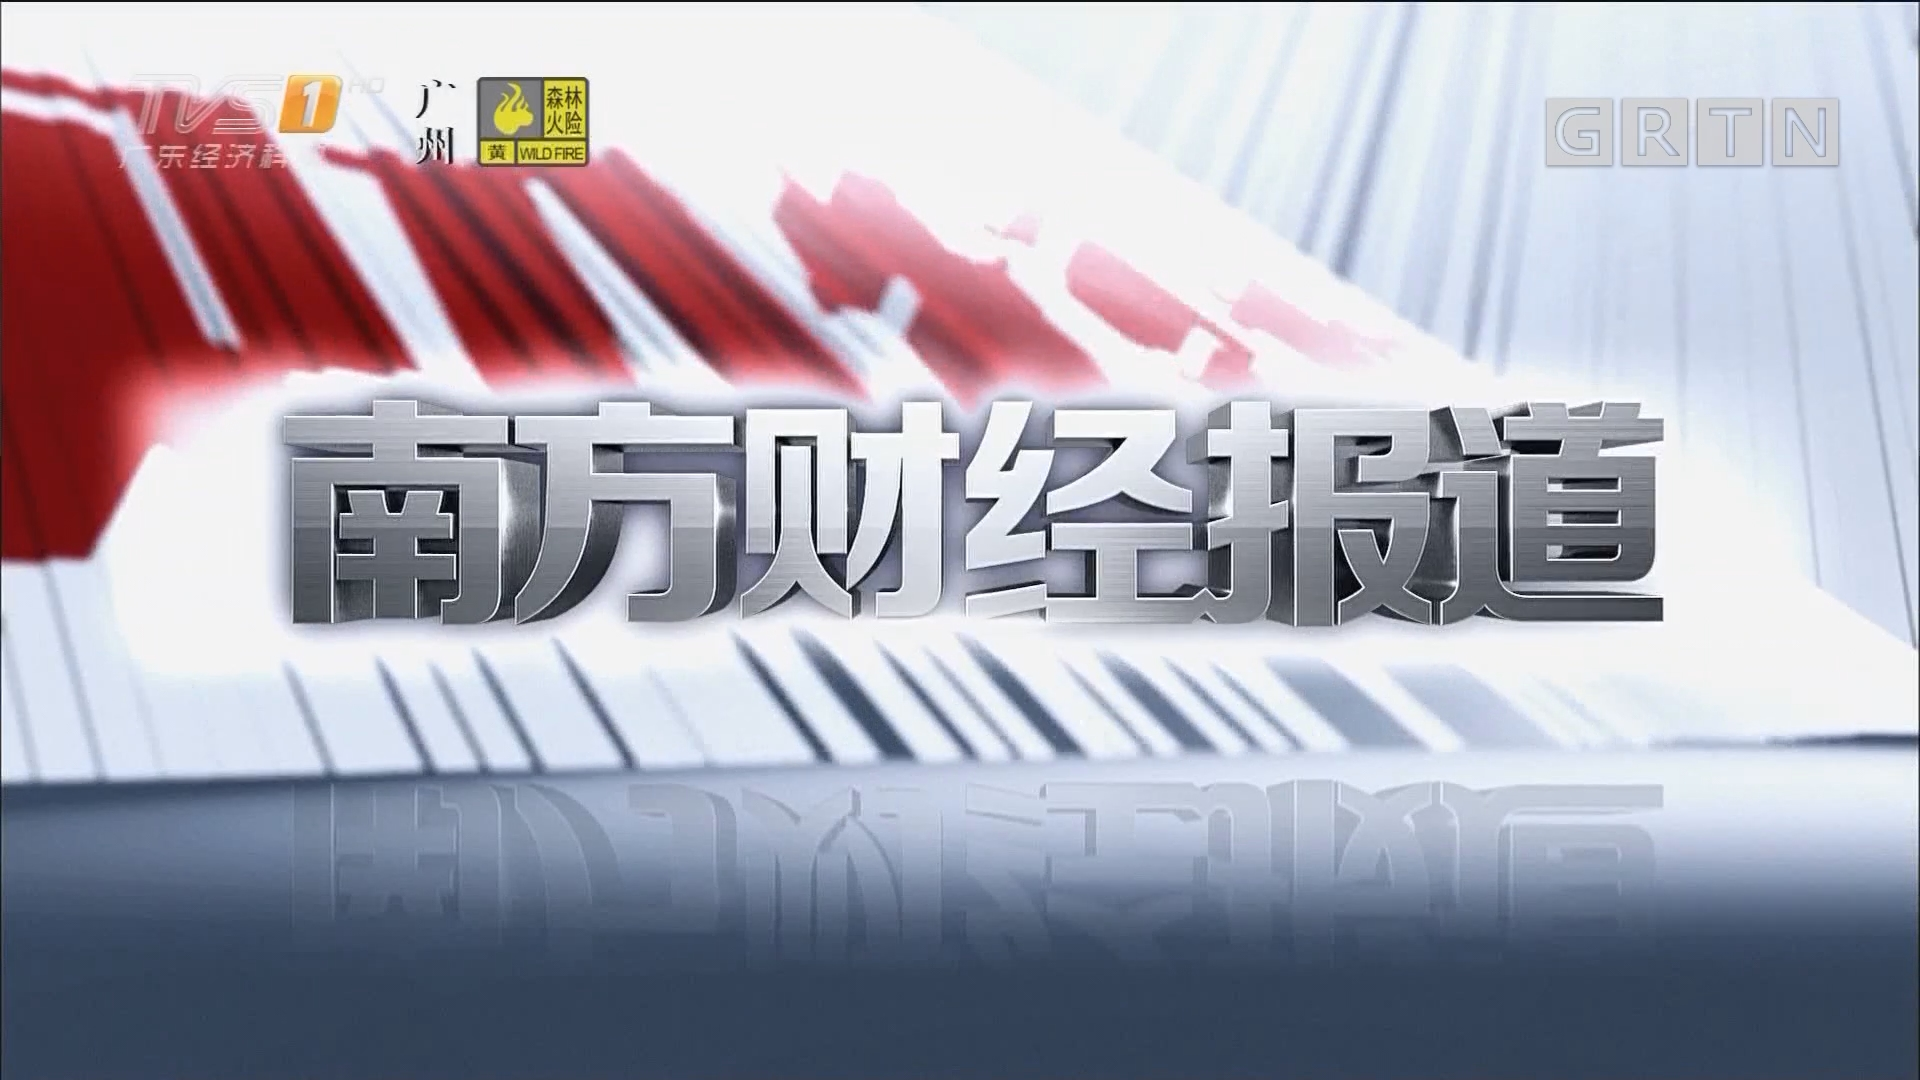 [HD][2018-11-12]南方财经报道:支持民营企业在行动 司法部:20条措施优化营商环境